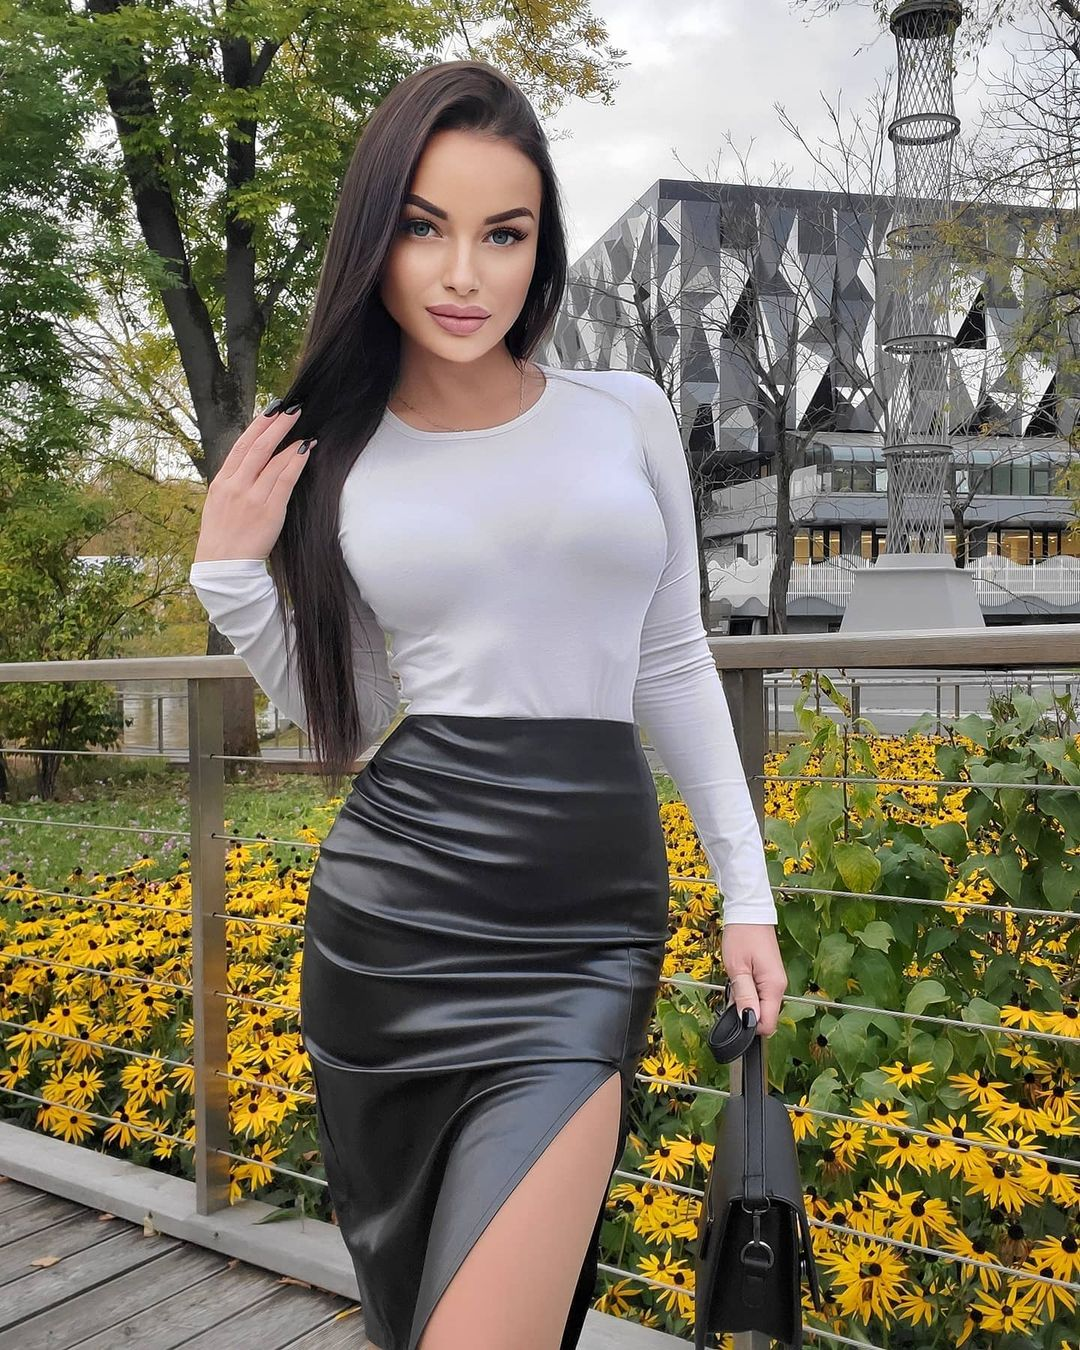 Aleksandra-Dontsu-Wallpapers-Insta-Fit-Bio-6